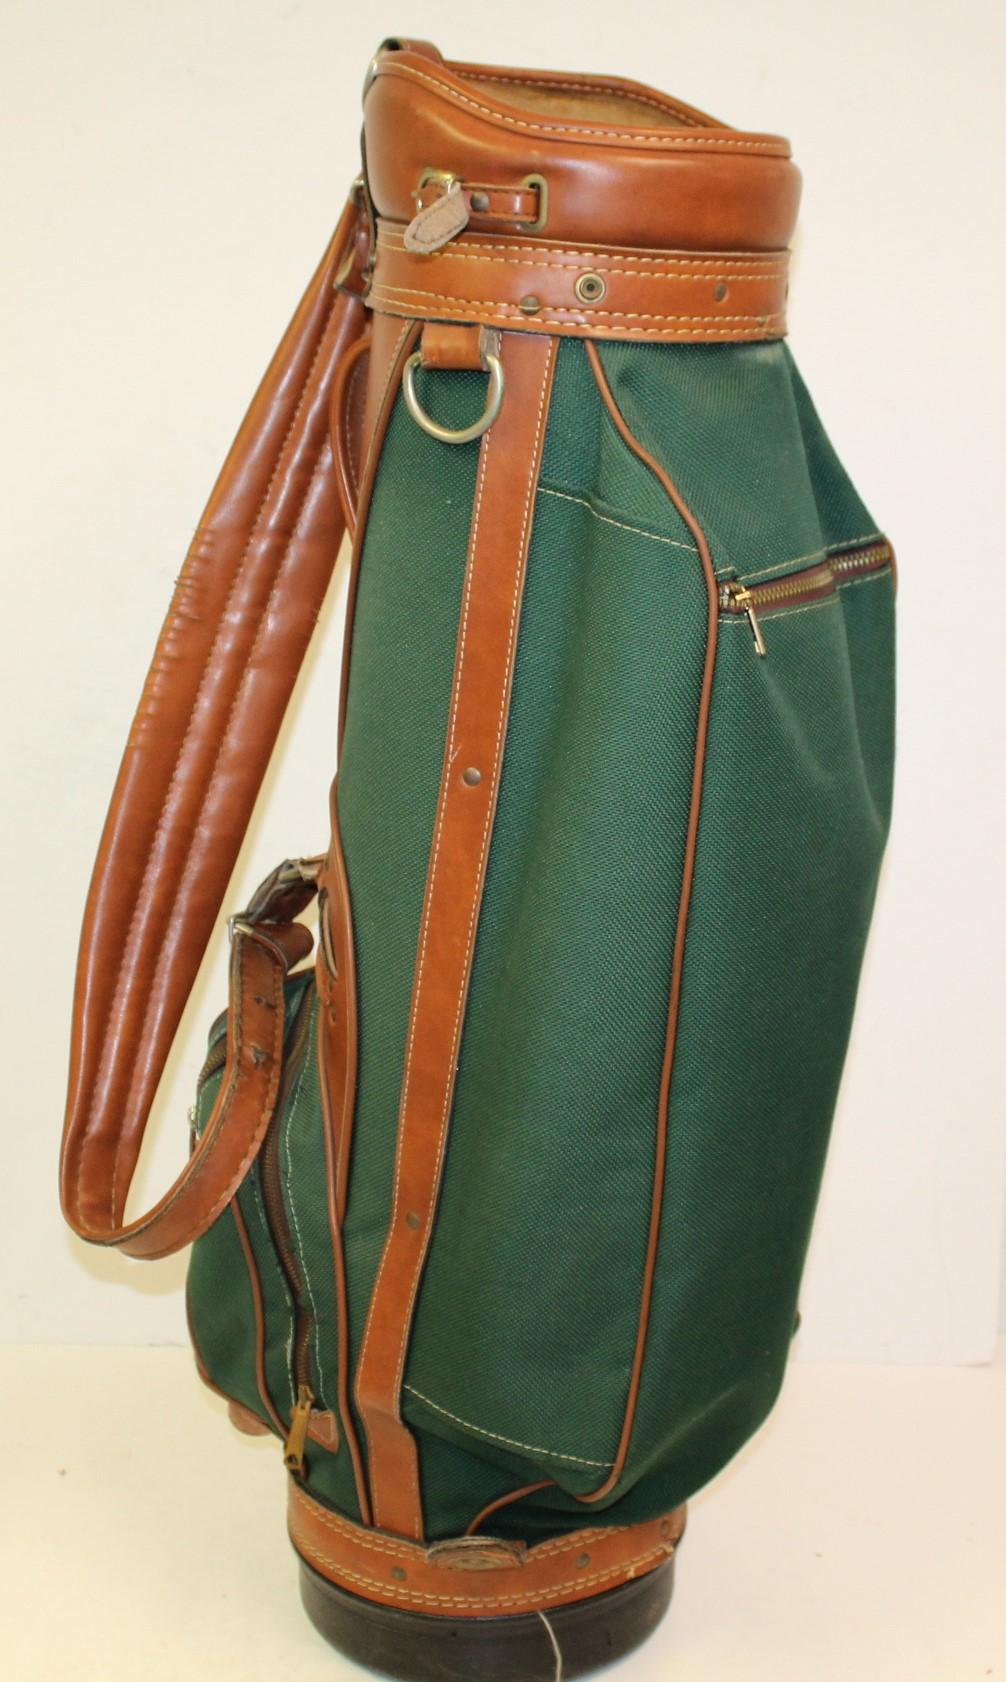 Hot-Z Golf 2.5 Cart Bag (Exclusive Colors